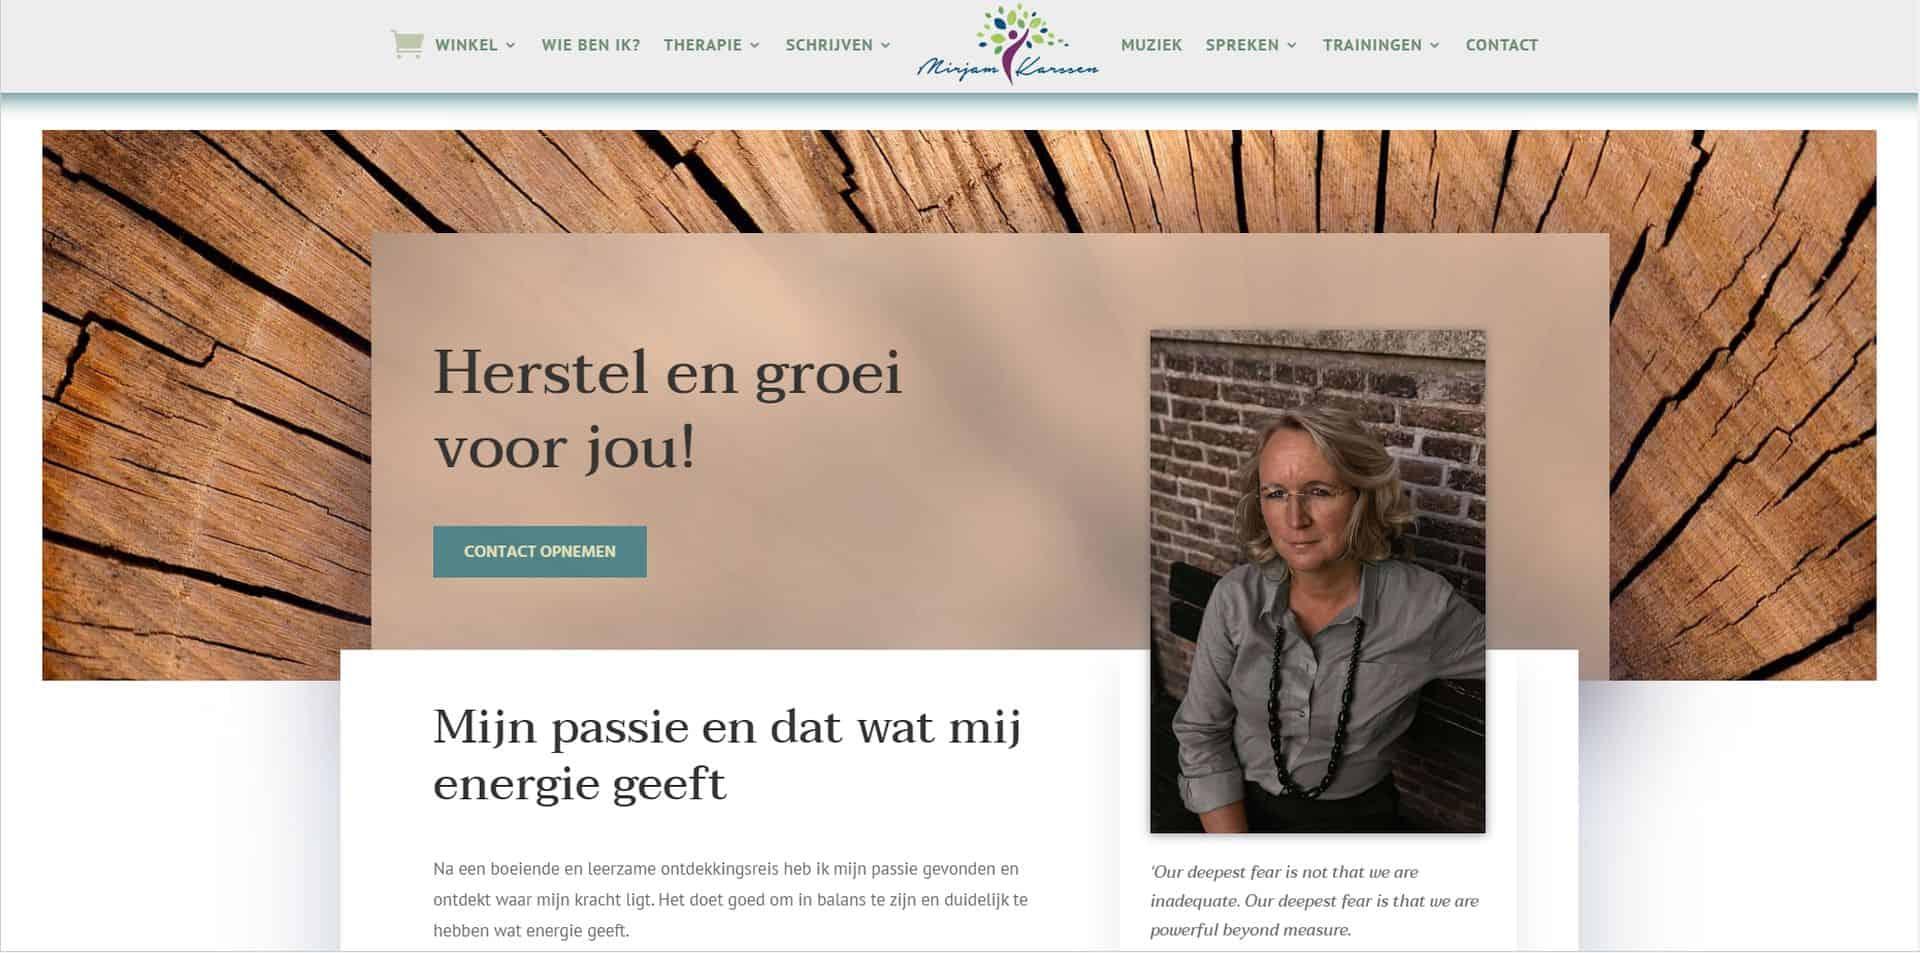 ons-werk-website-mirjamkarssen.nl